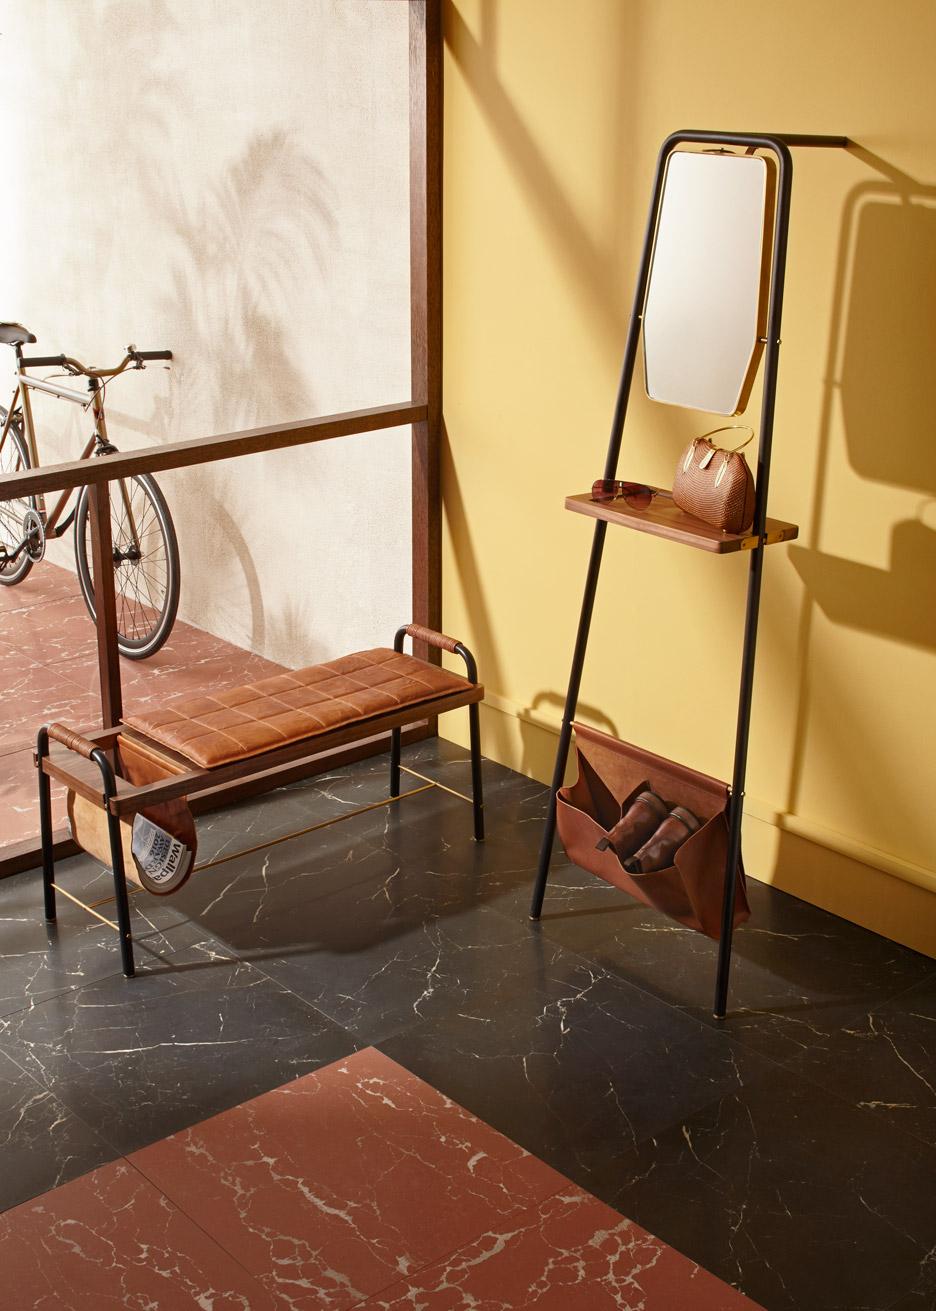 valet-collection-david-rockwell-group-stellar-works-furniture-milan-2016_dezeen_936_9